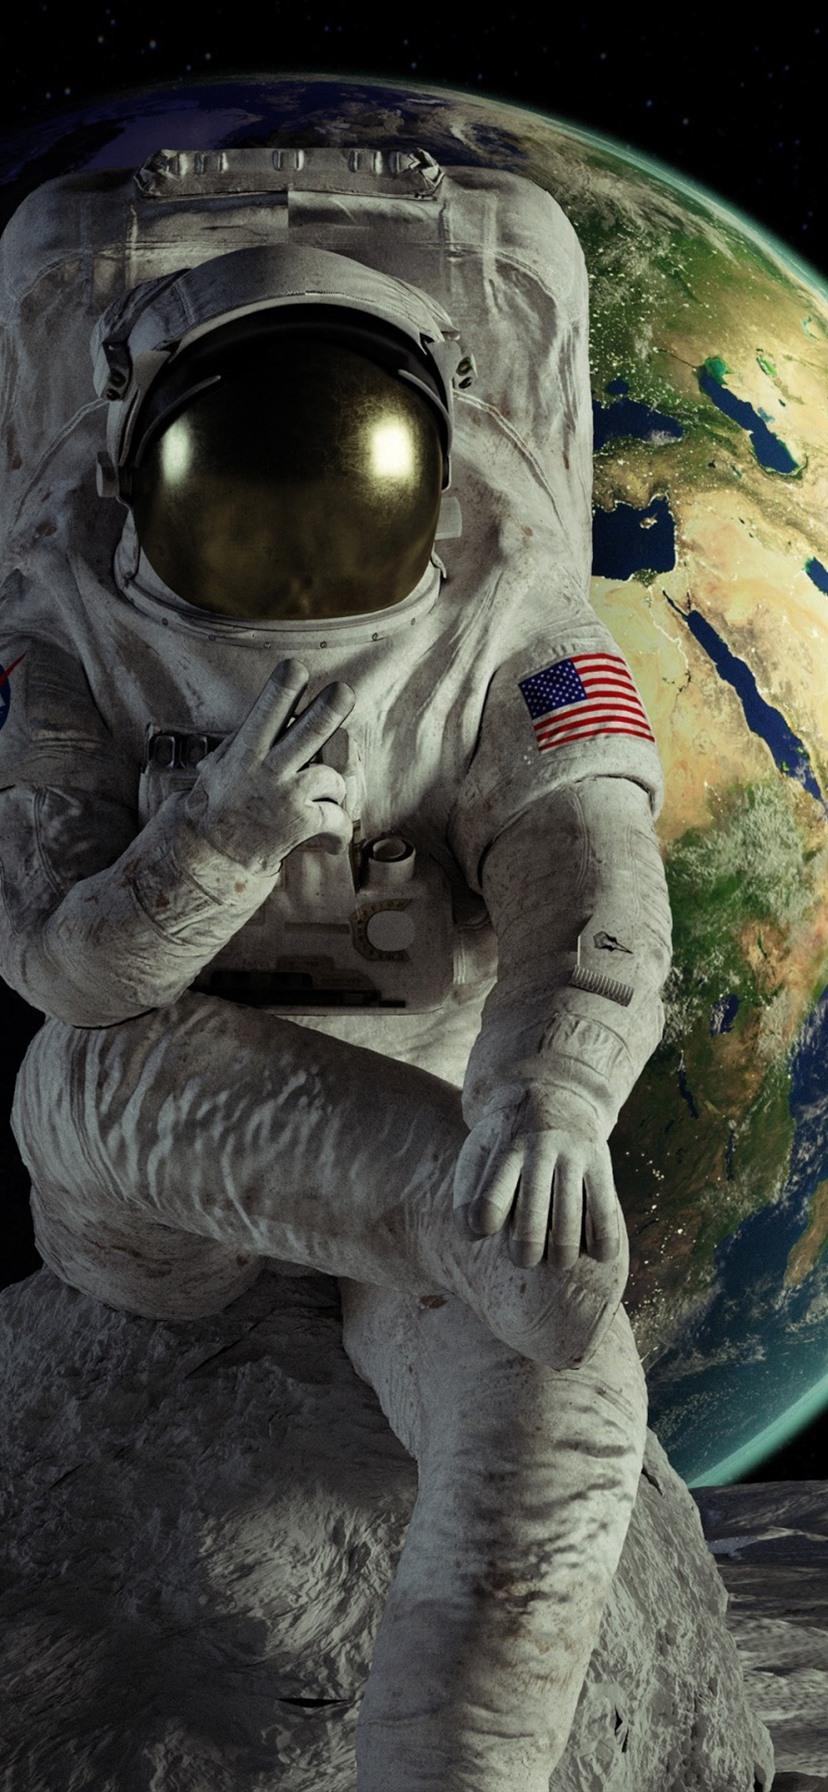 Astronaut Earth moon